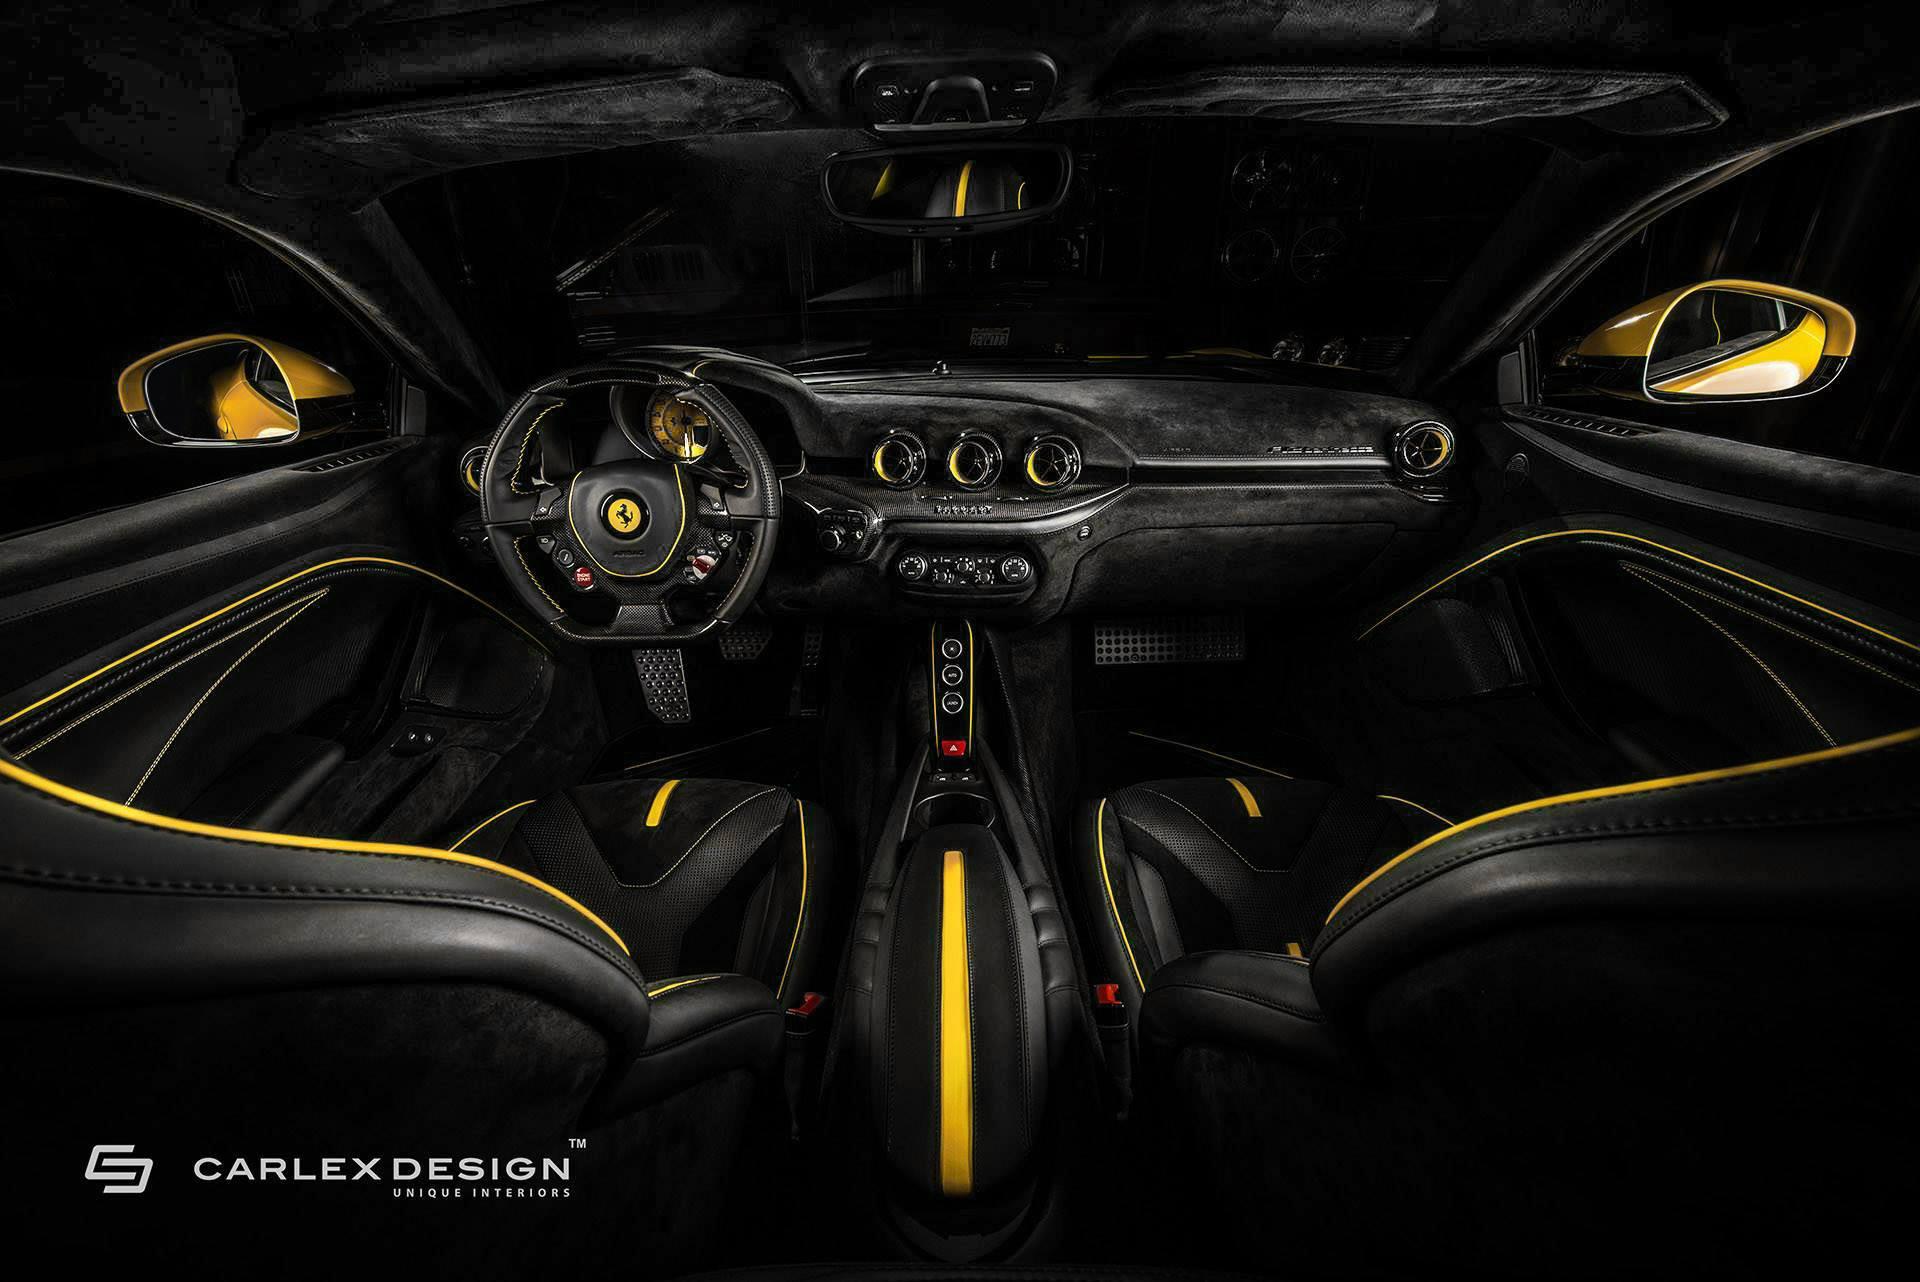 Ferrari F12Berlinetta Carxlex Design